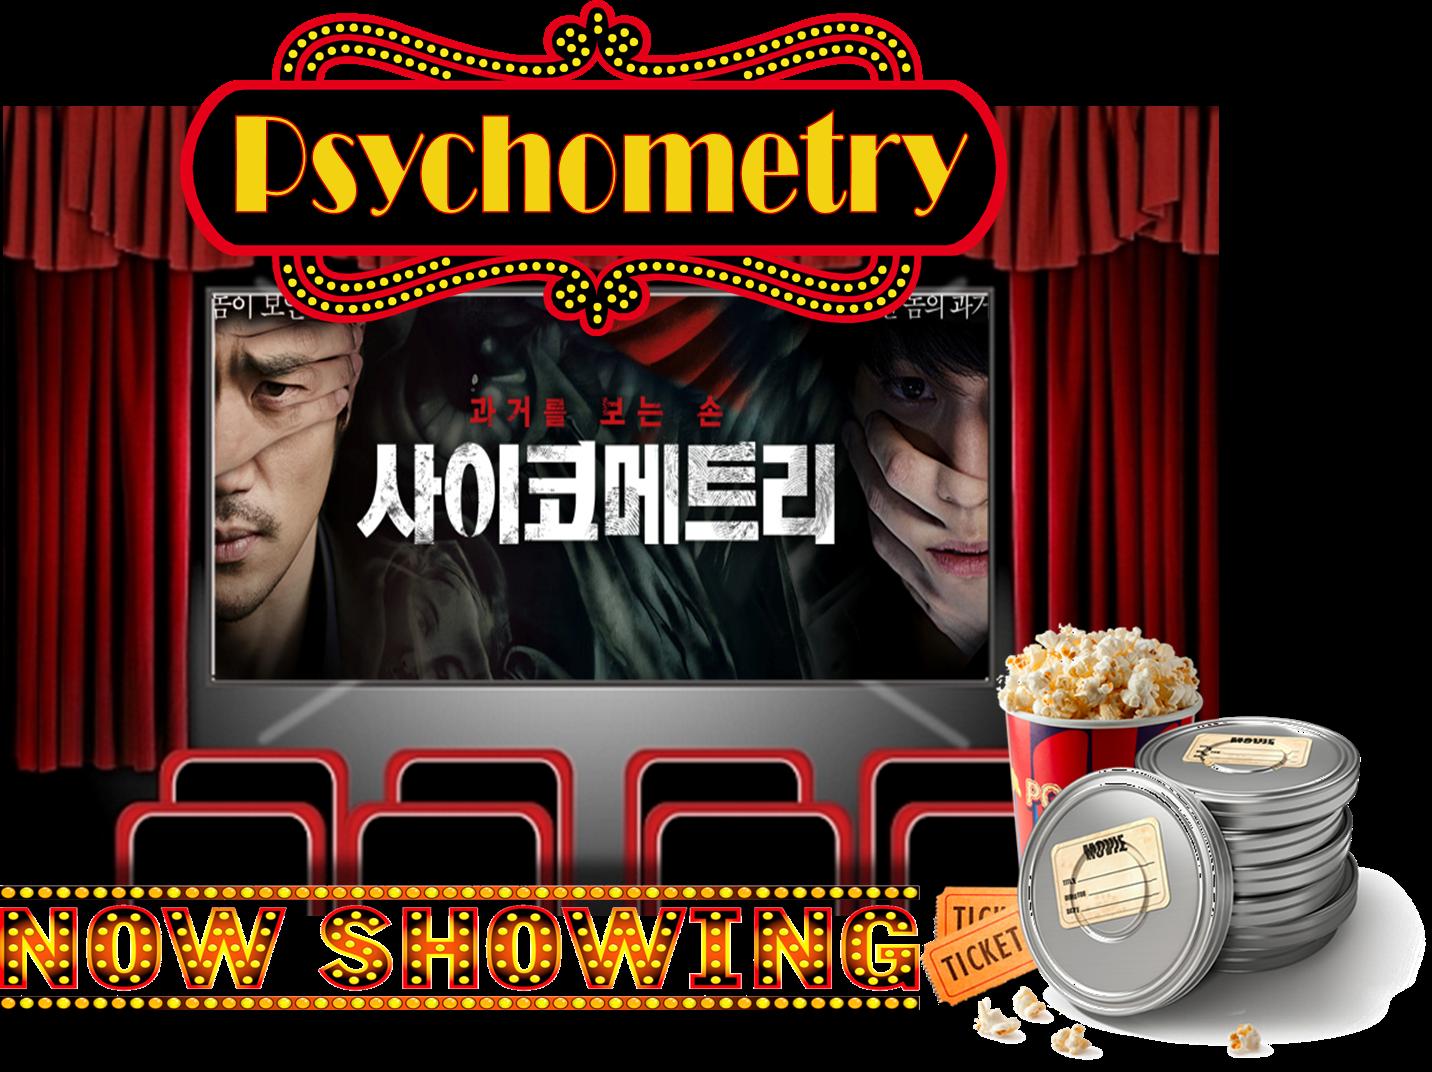 Psychometry 2013 720p HDRip H264-Mbaro